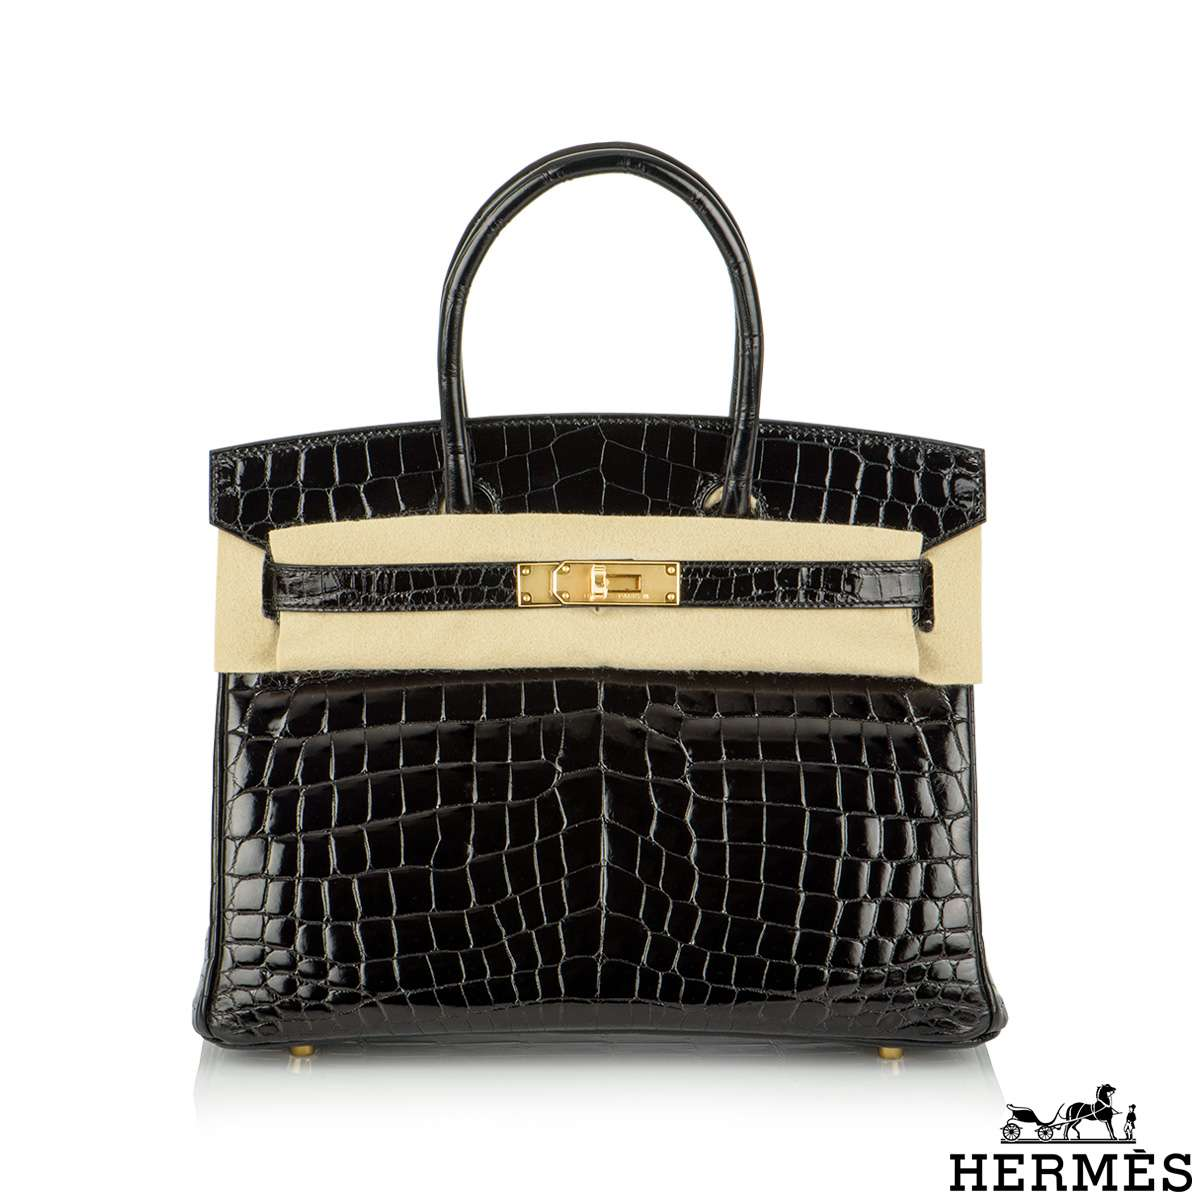 Hermès 30cm Sac Noir Niloticus Crocodile Birkin Bag